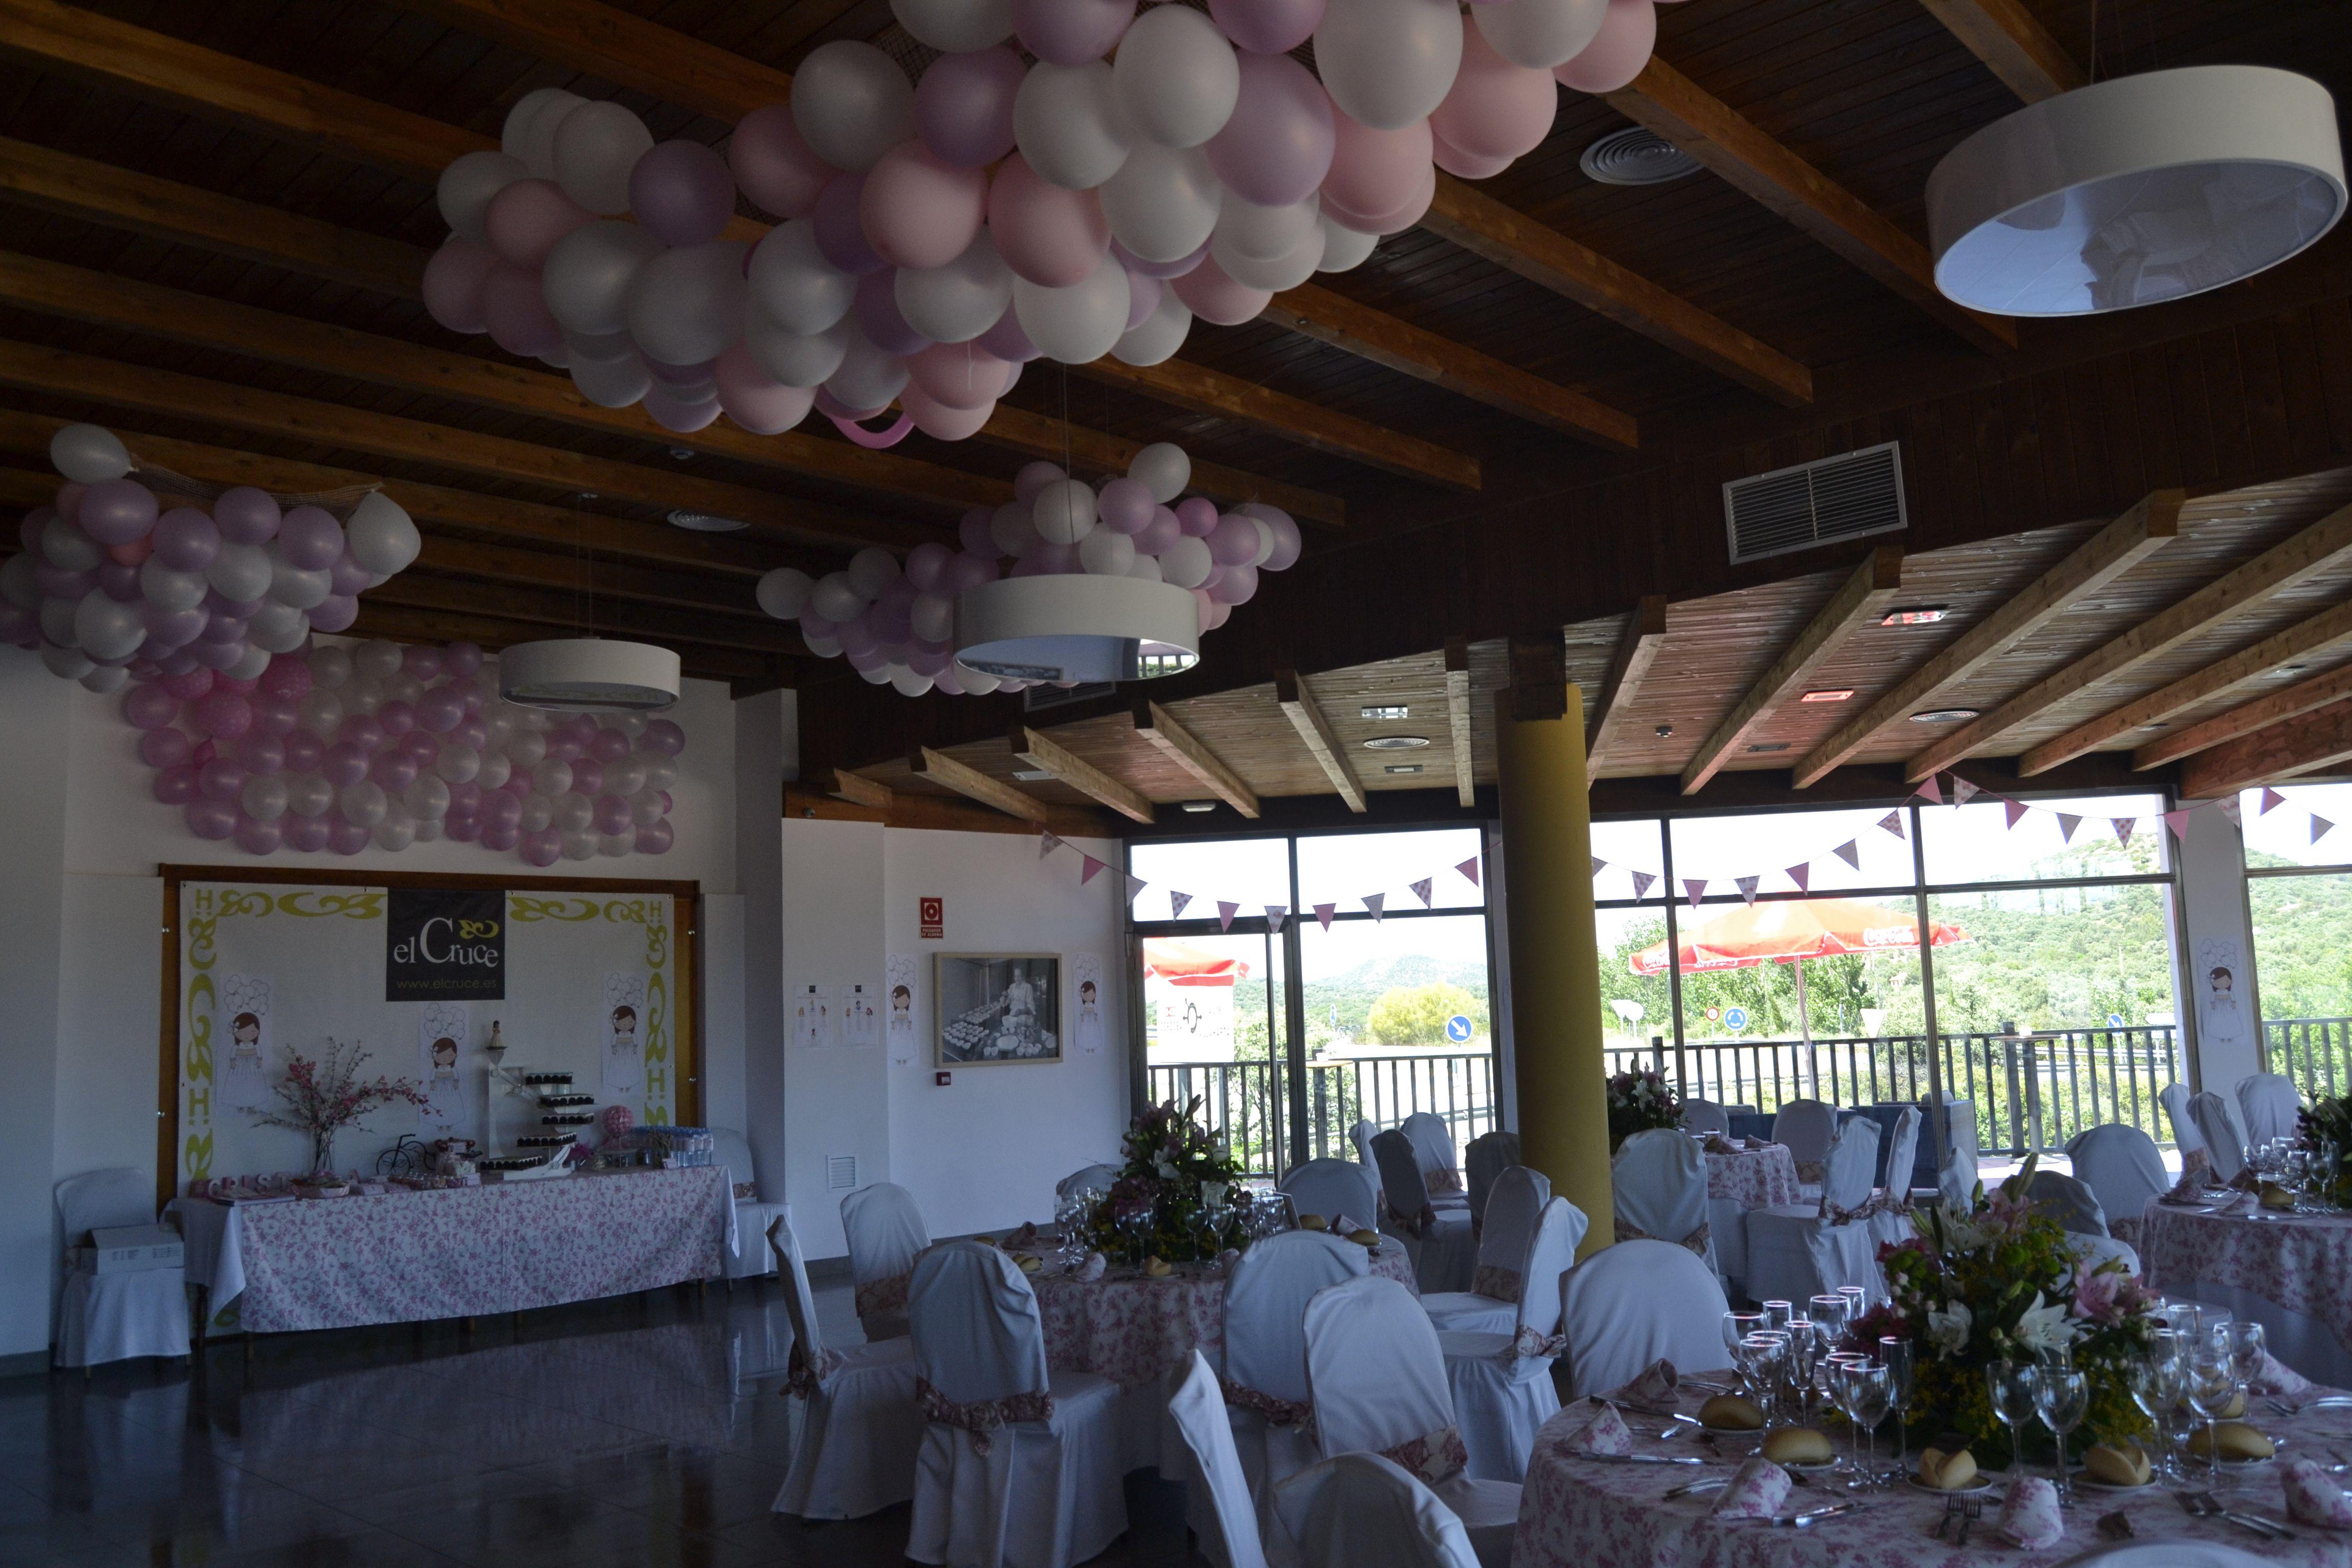 Restaurante de carnes a la brasa en Córdoba